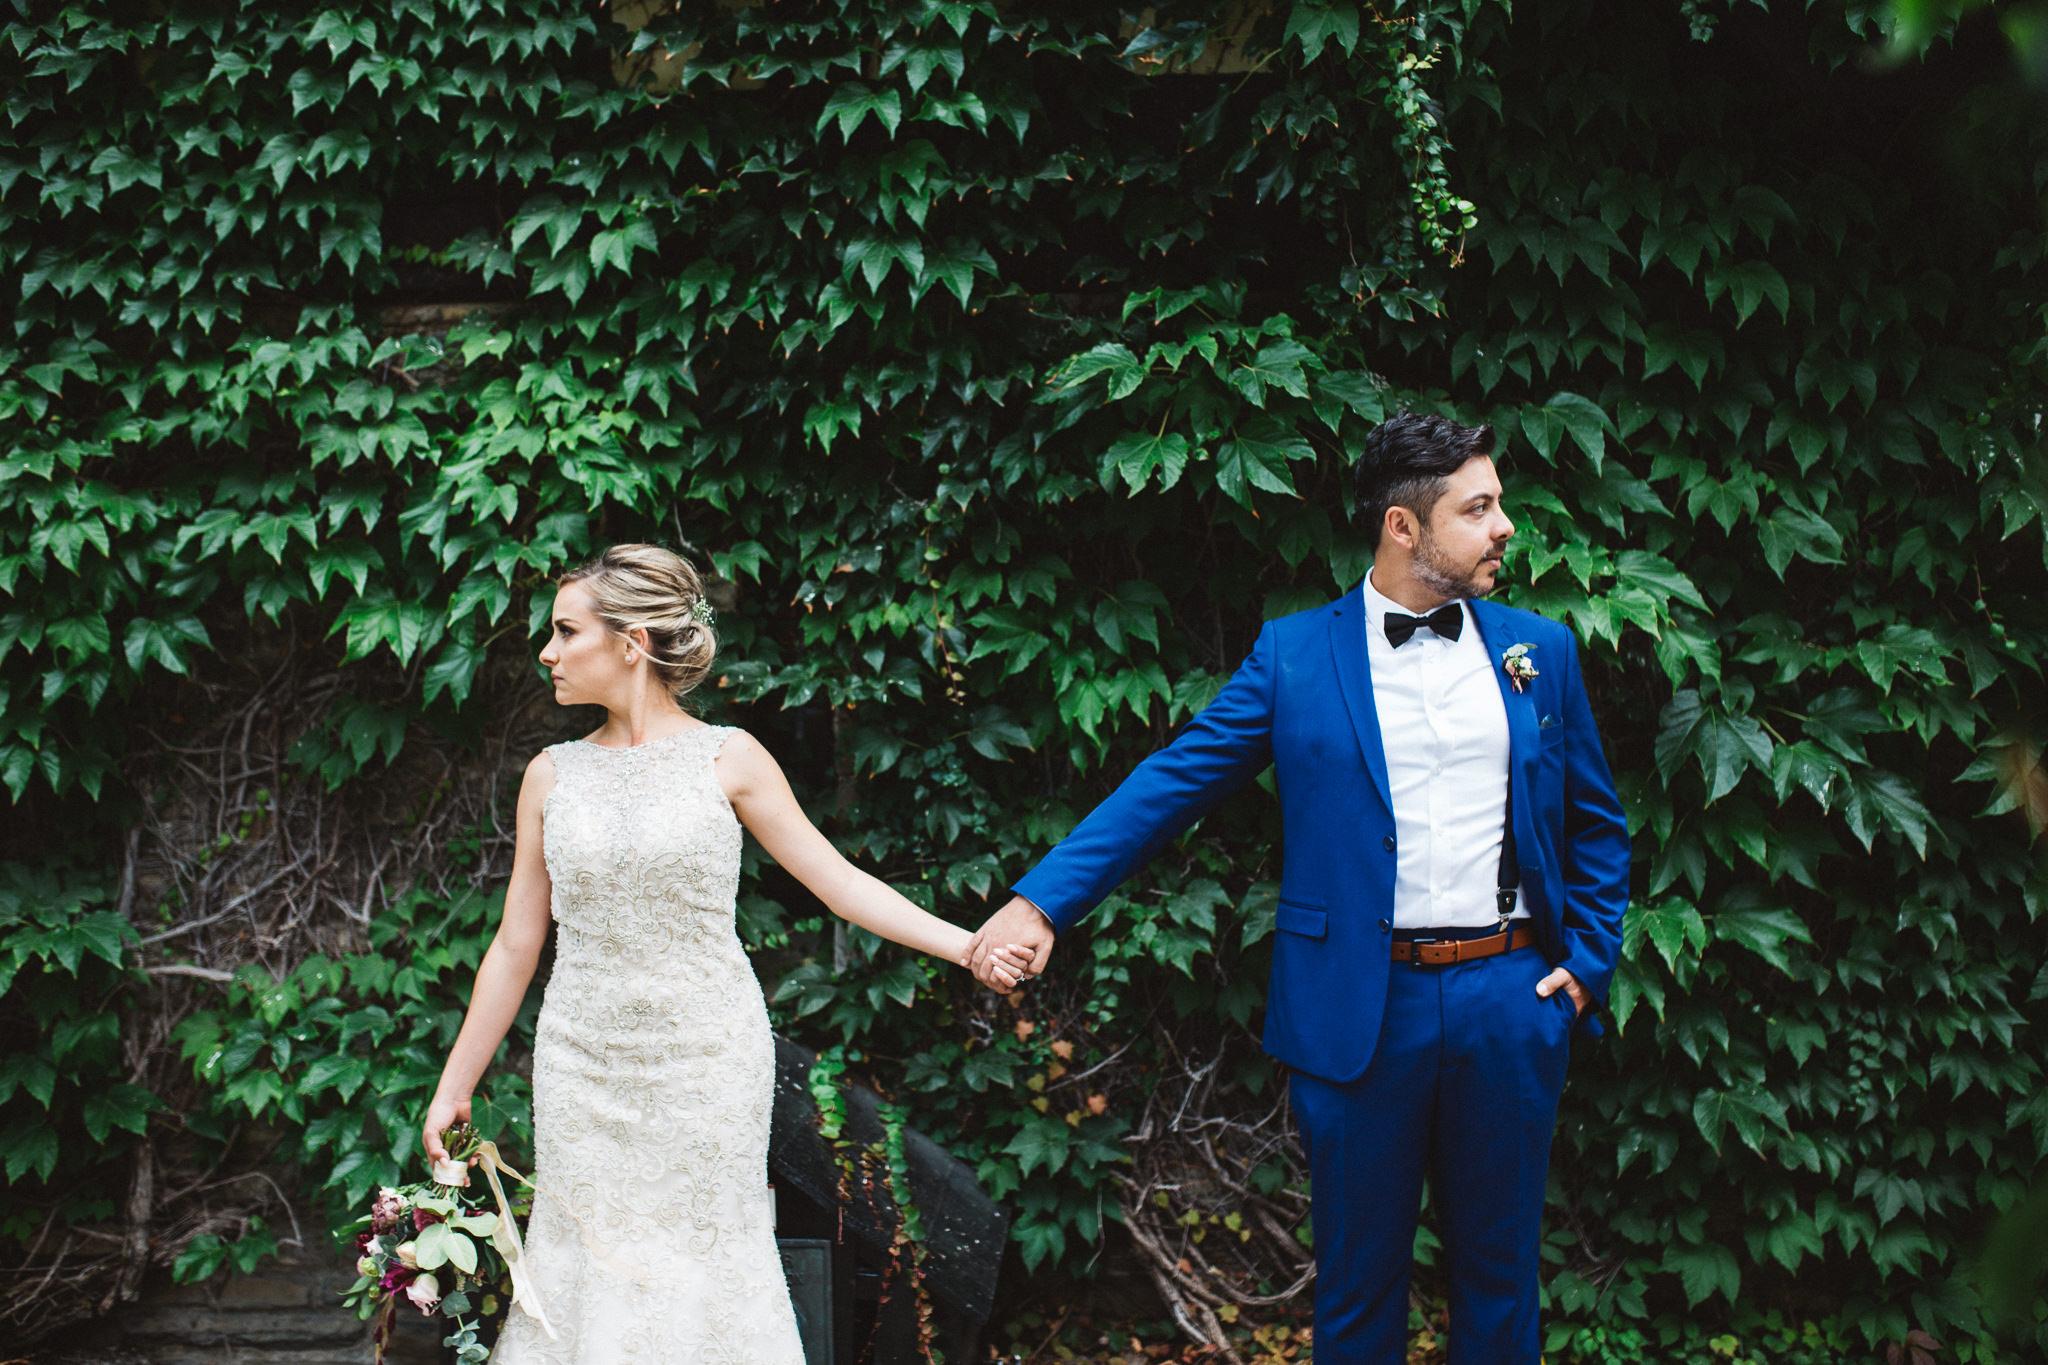 Toronto summer wedding at Old Mill Inn by Max Wong Photo (38)